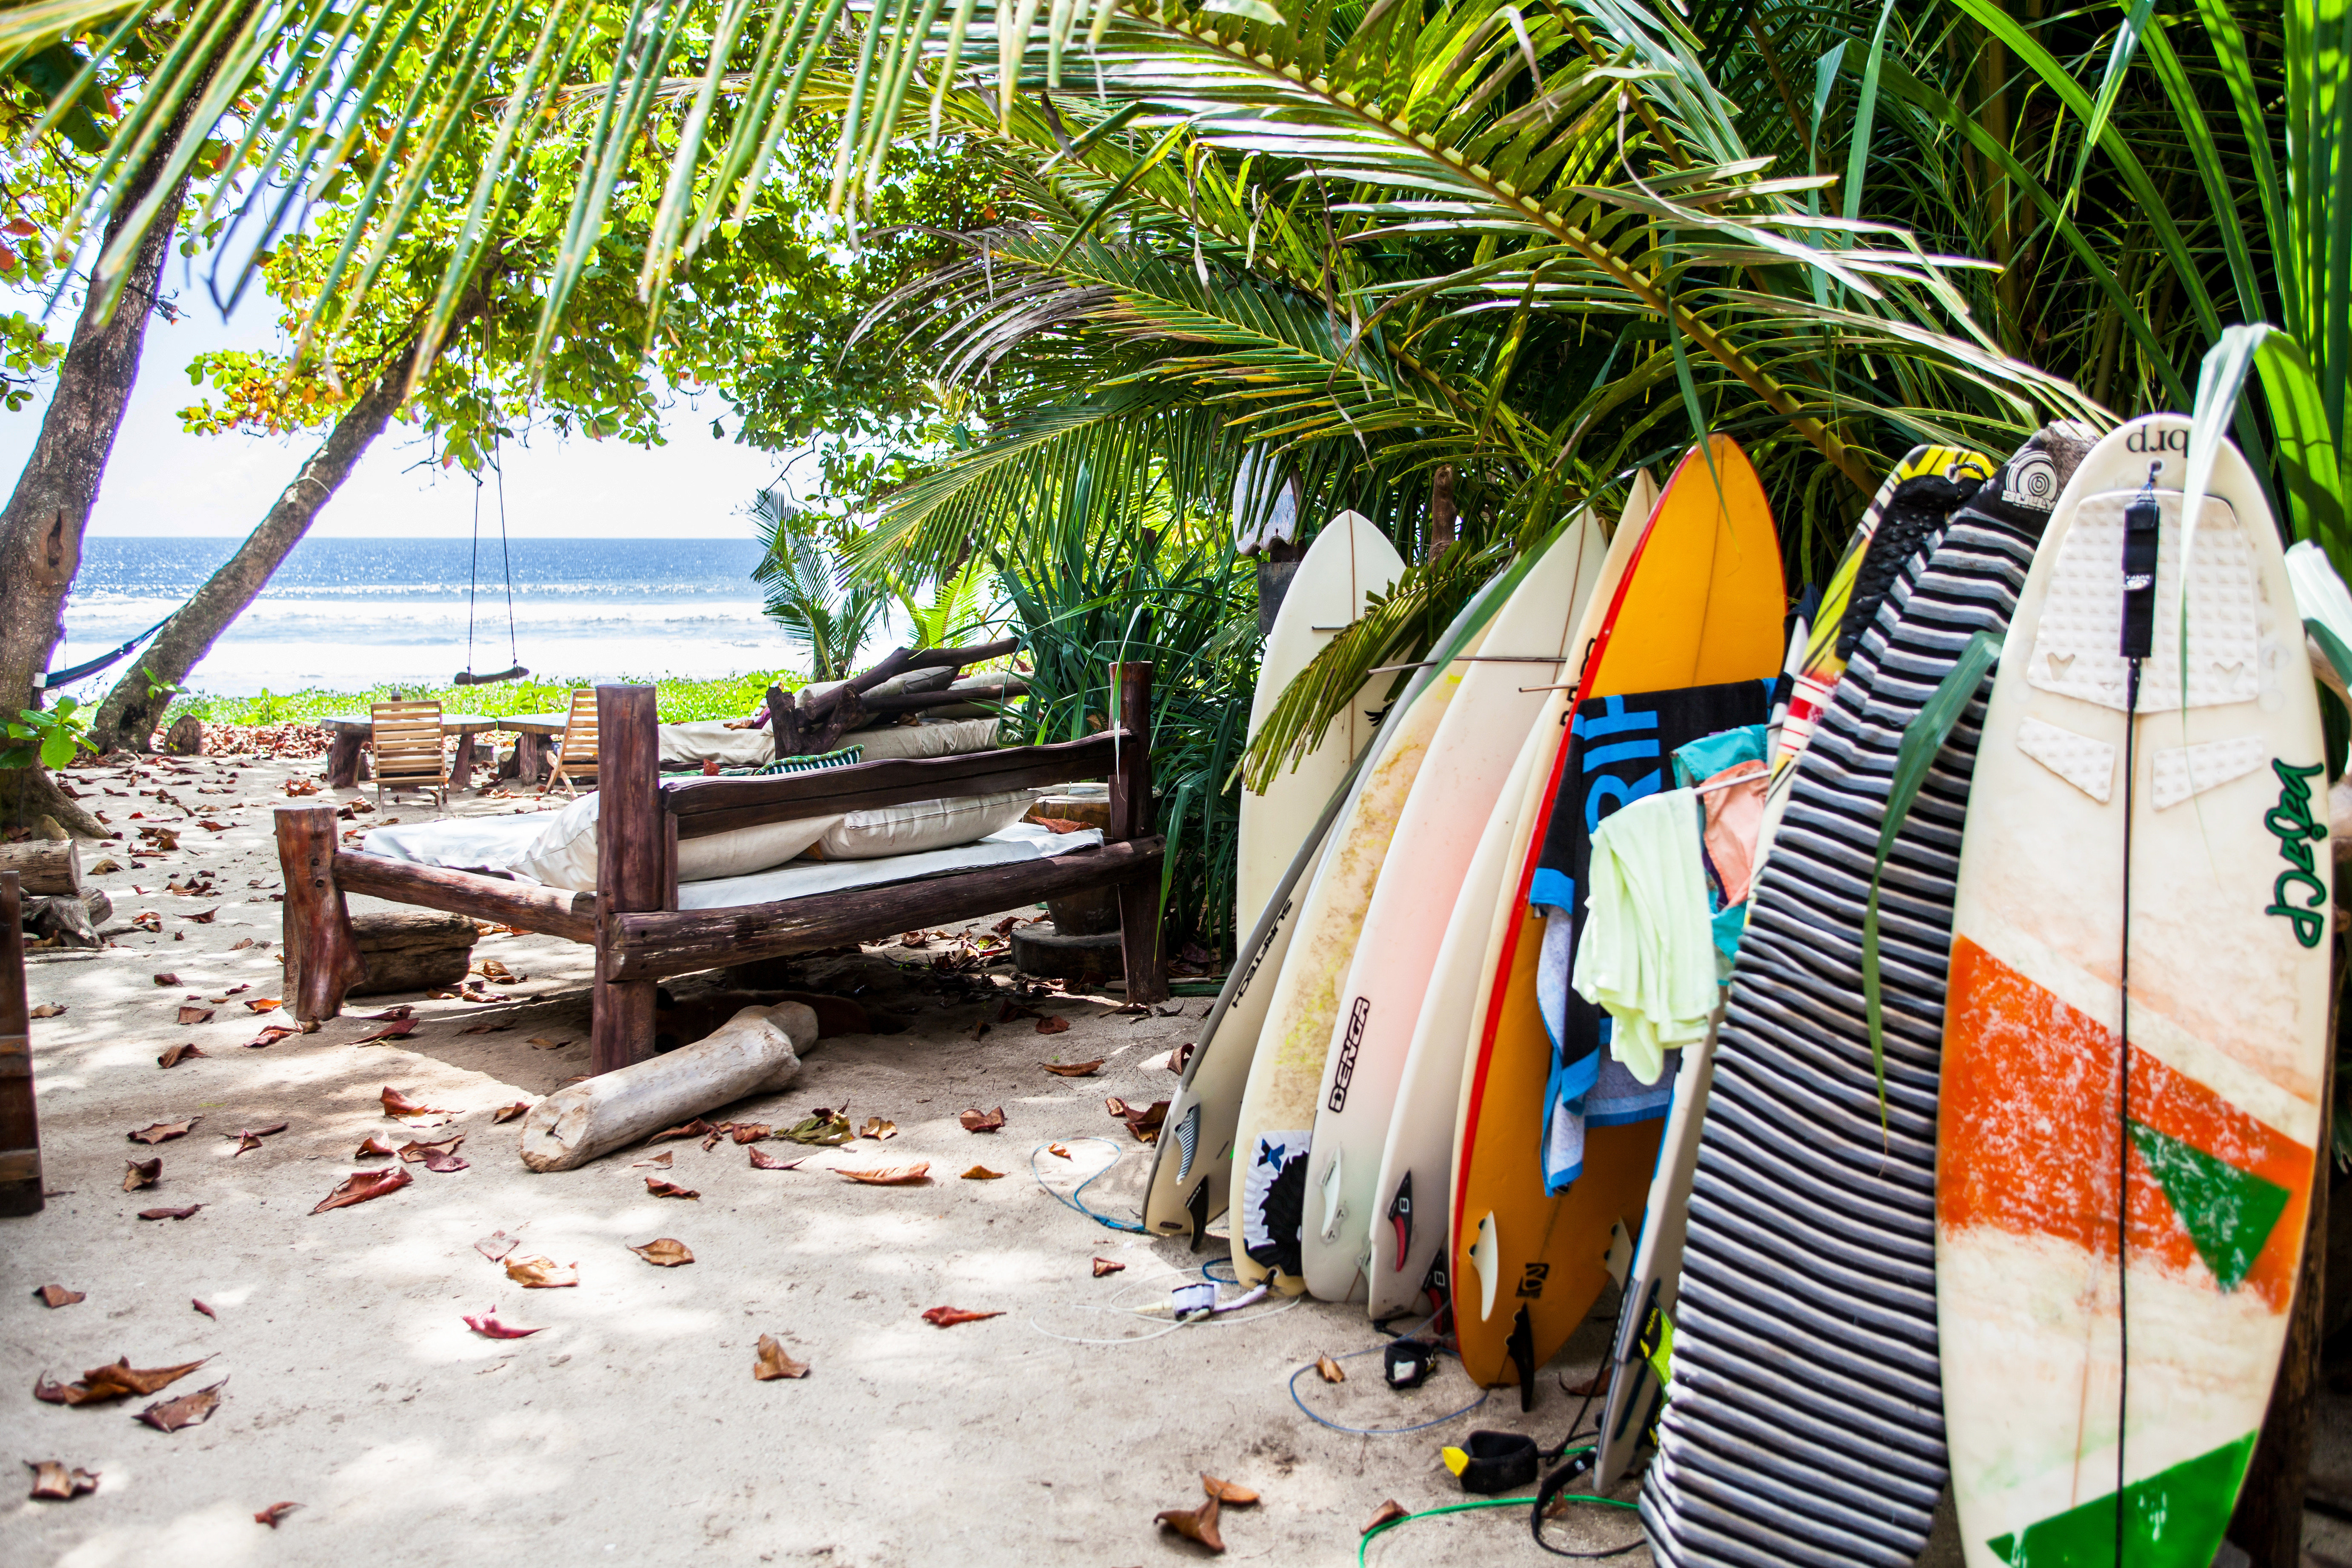 Adventure Beach Eco Grounds Jungle Outdoor Activities Romantic Rustic Scenic views tree arecales sandy